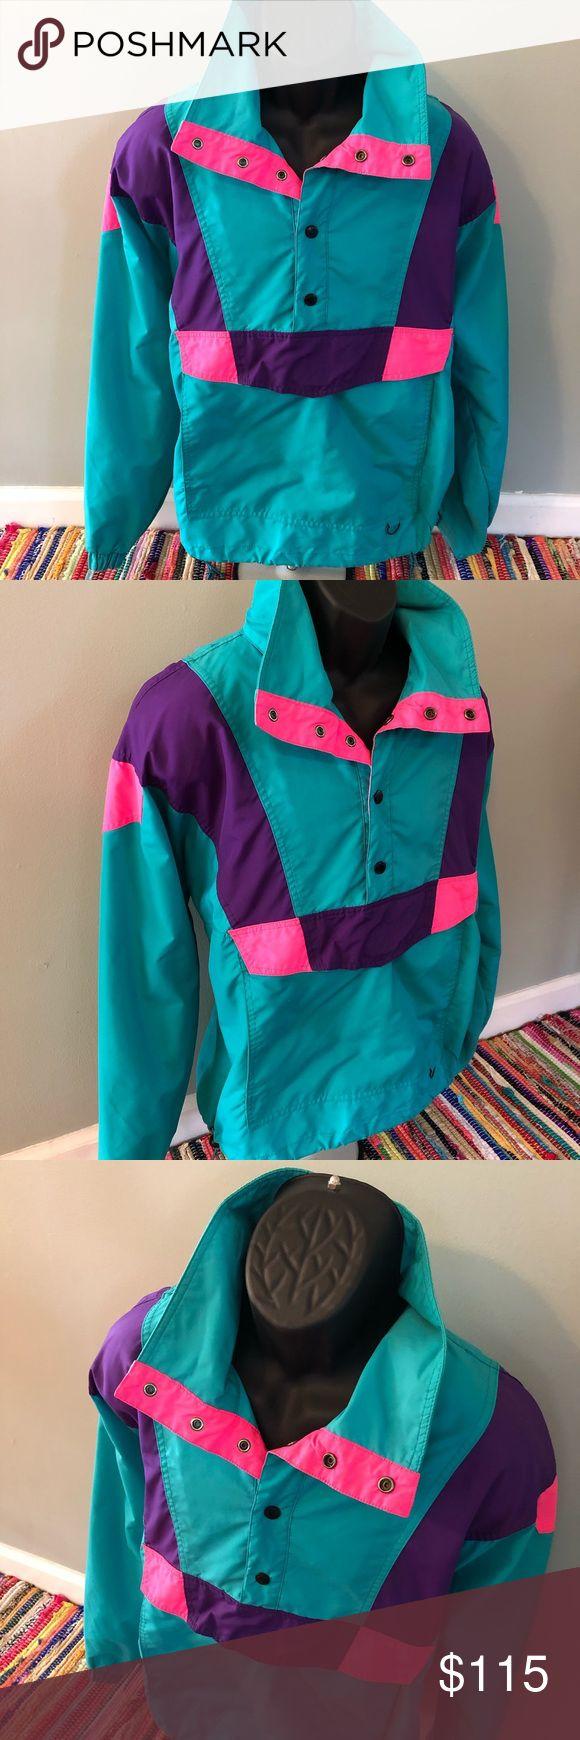 80s neon 80s Neon Ski Jacket Snow Winter Coat Vintage